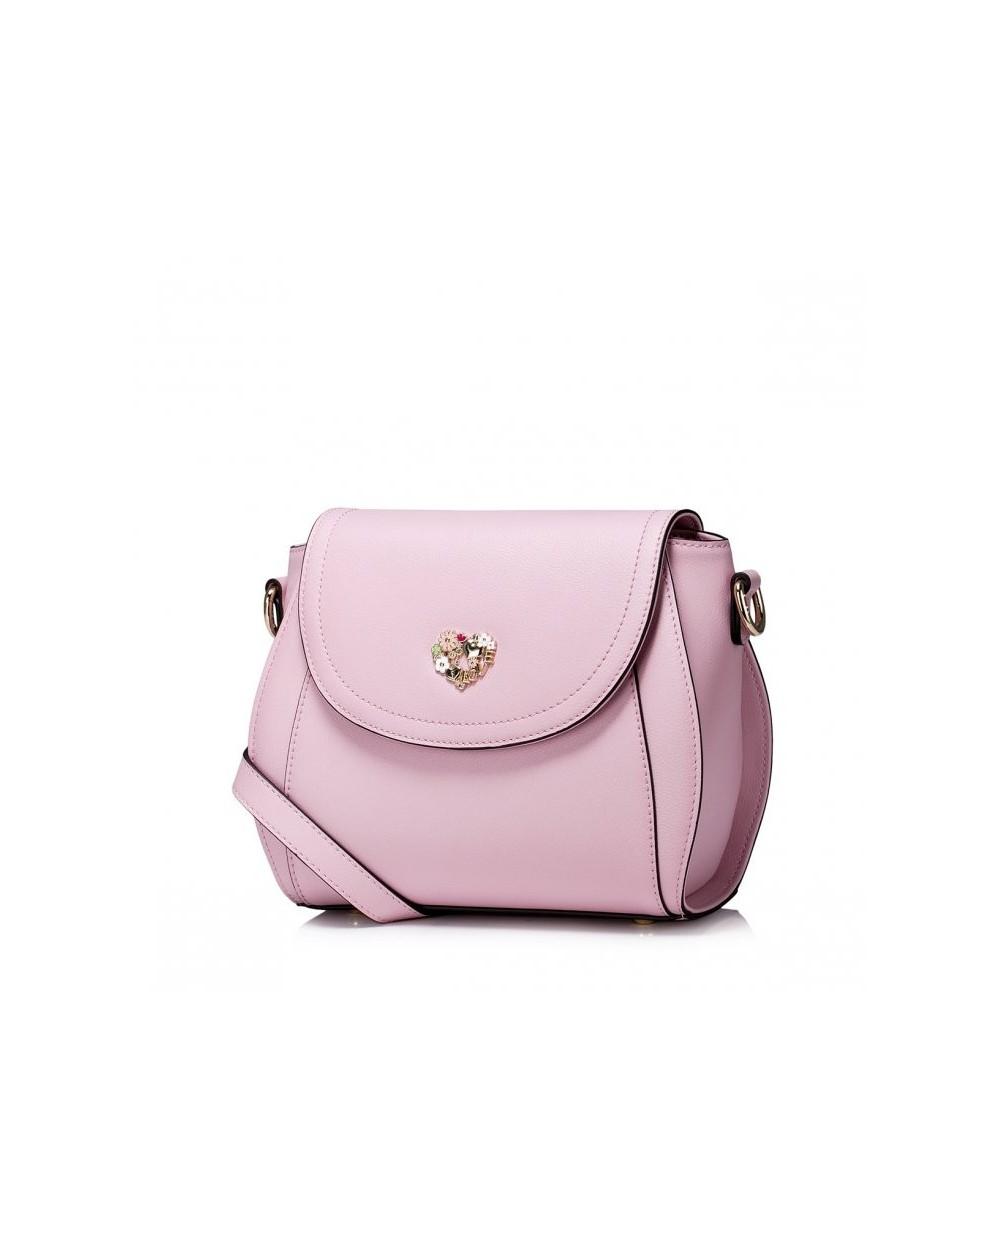 Damska skórzana torebka na ramię Różowa